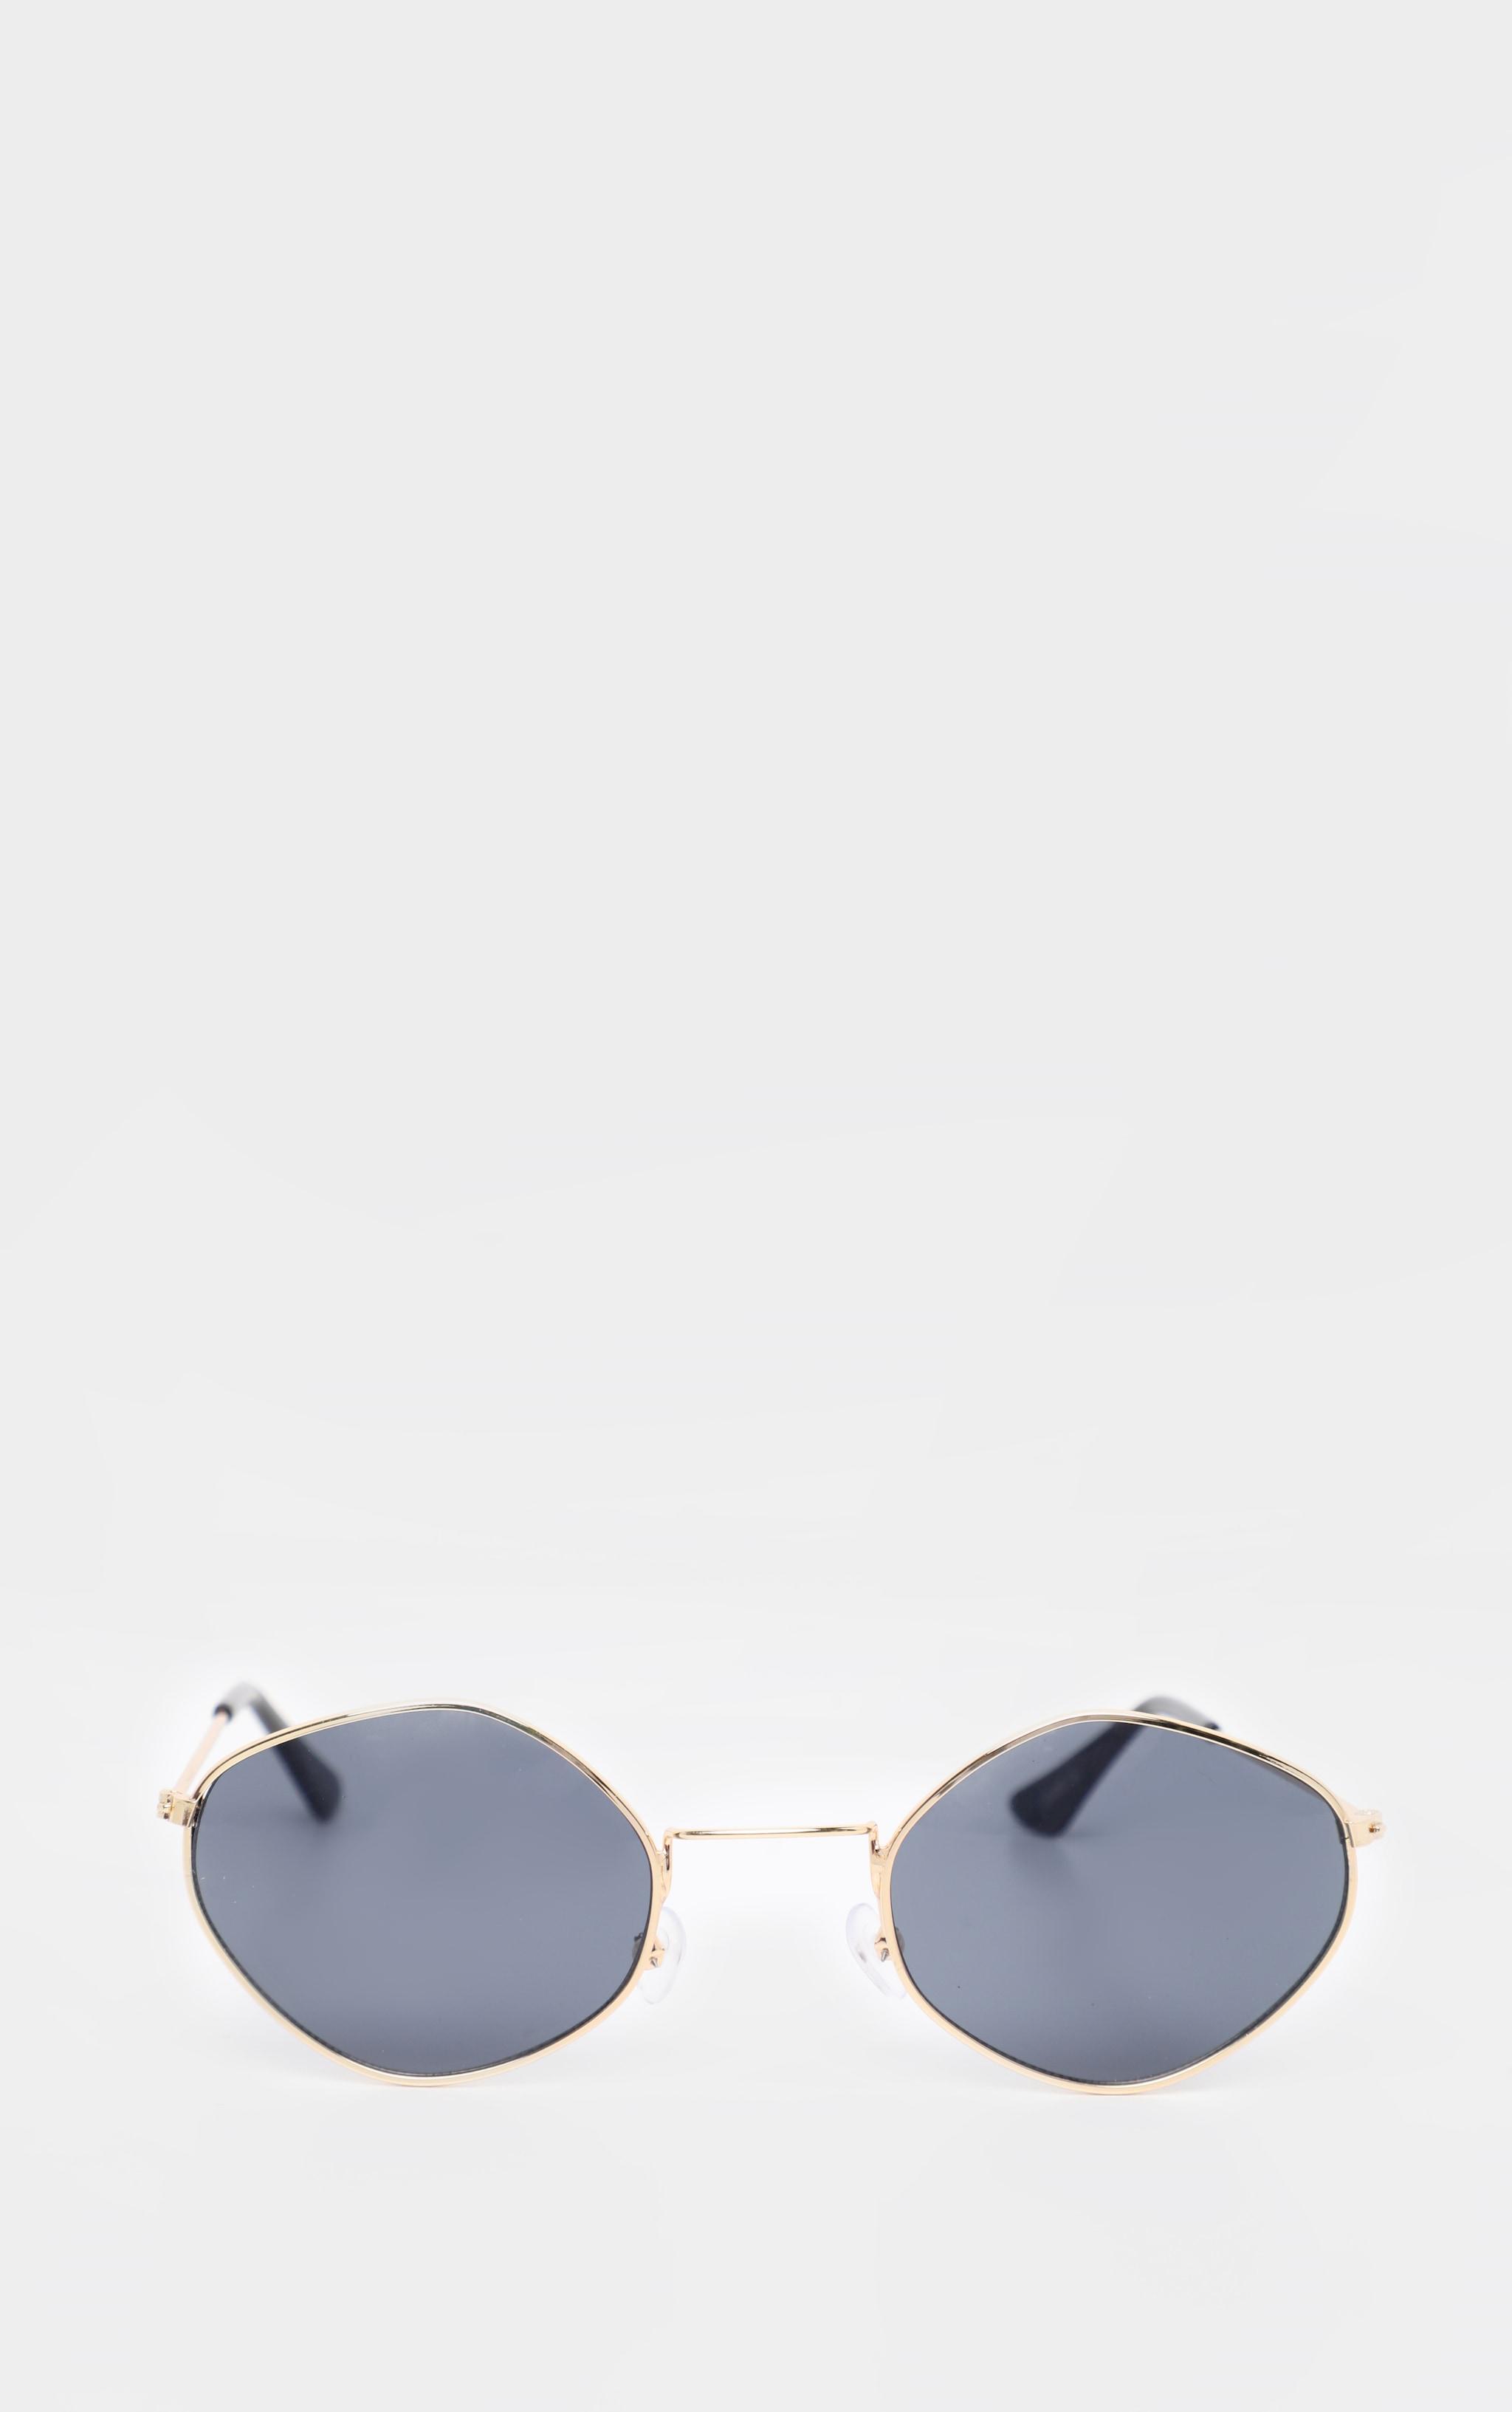 Grey Hexagon Shape Glasses 2